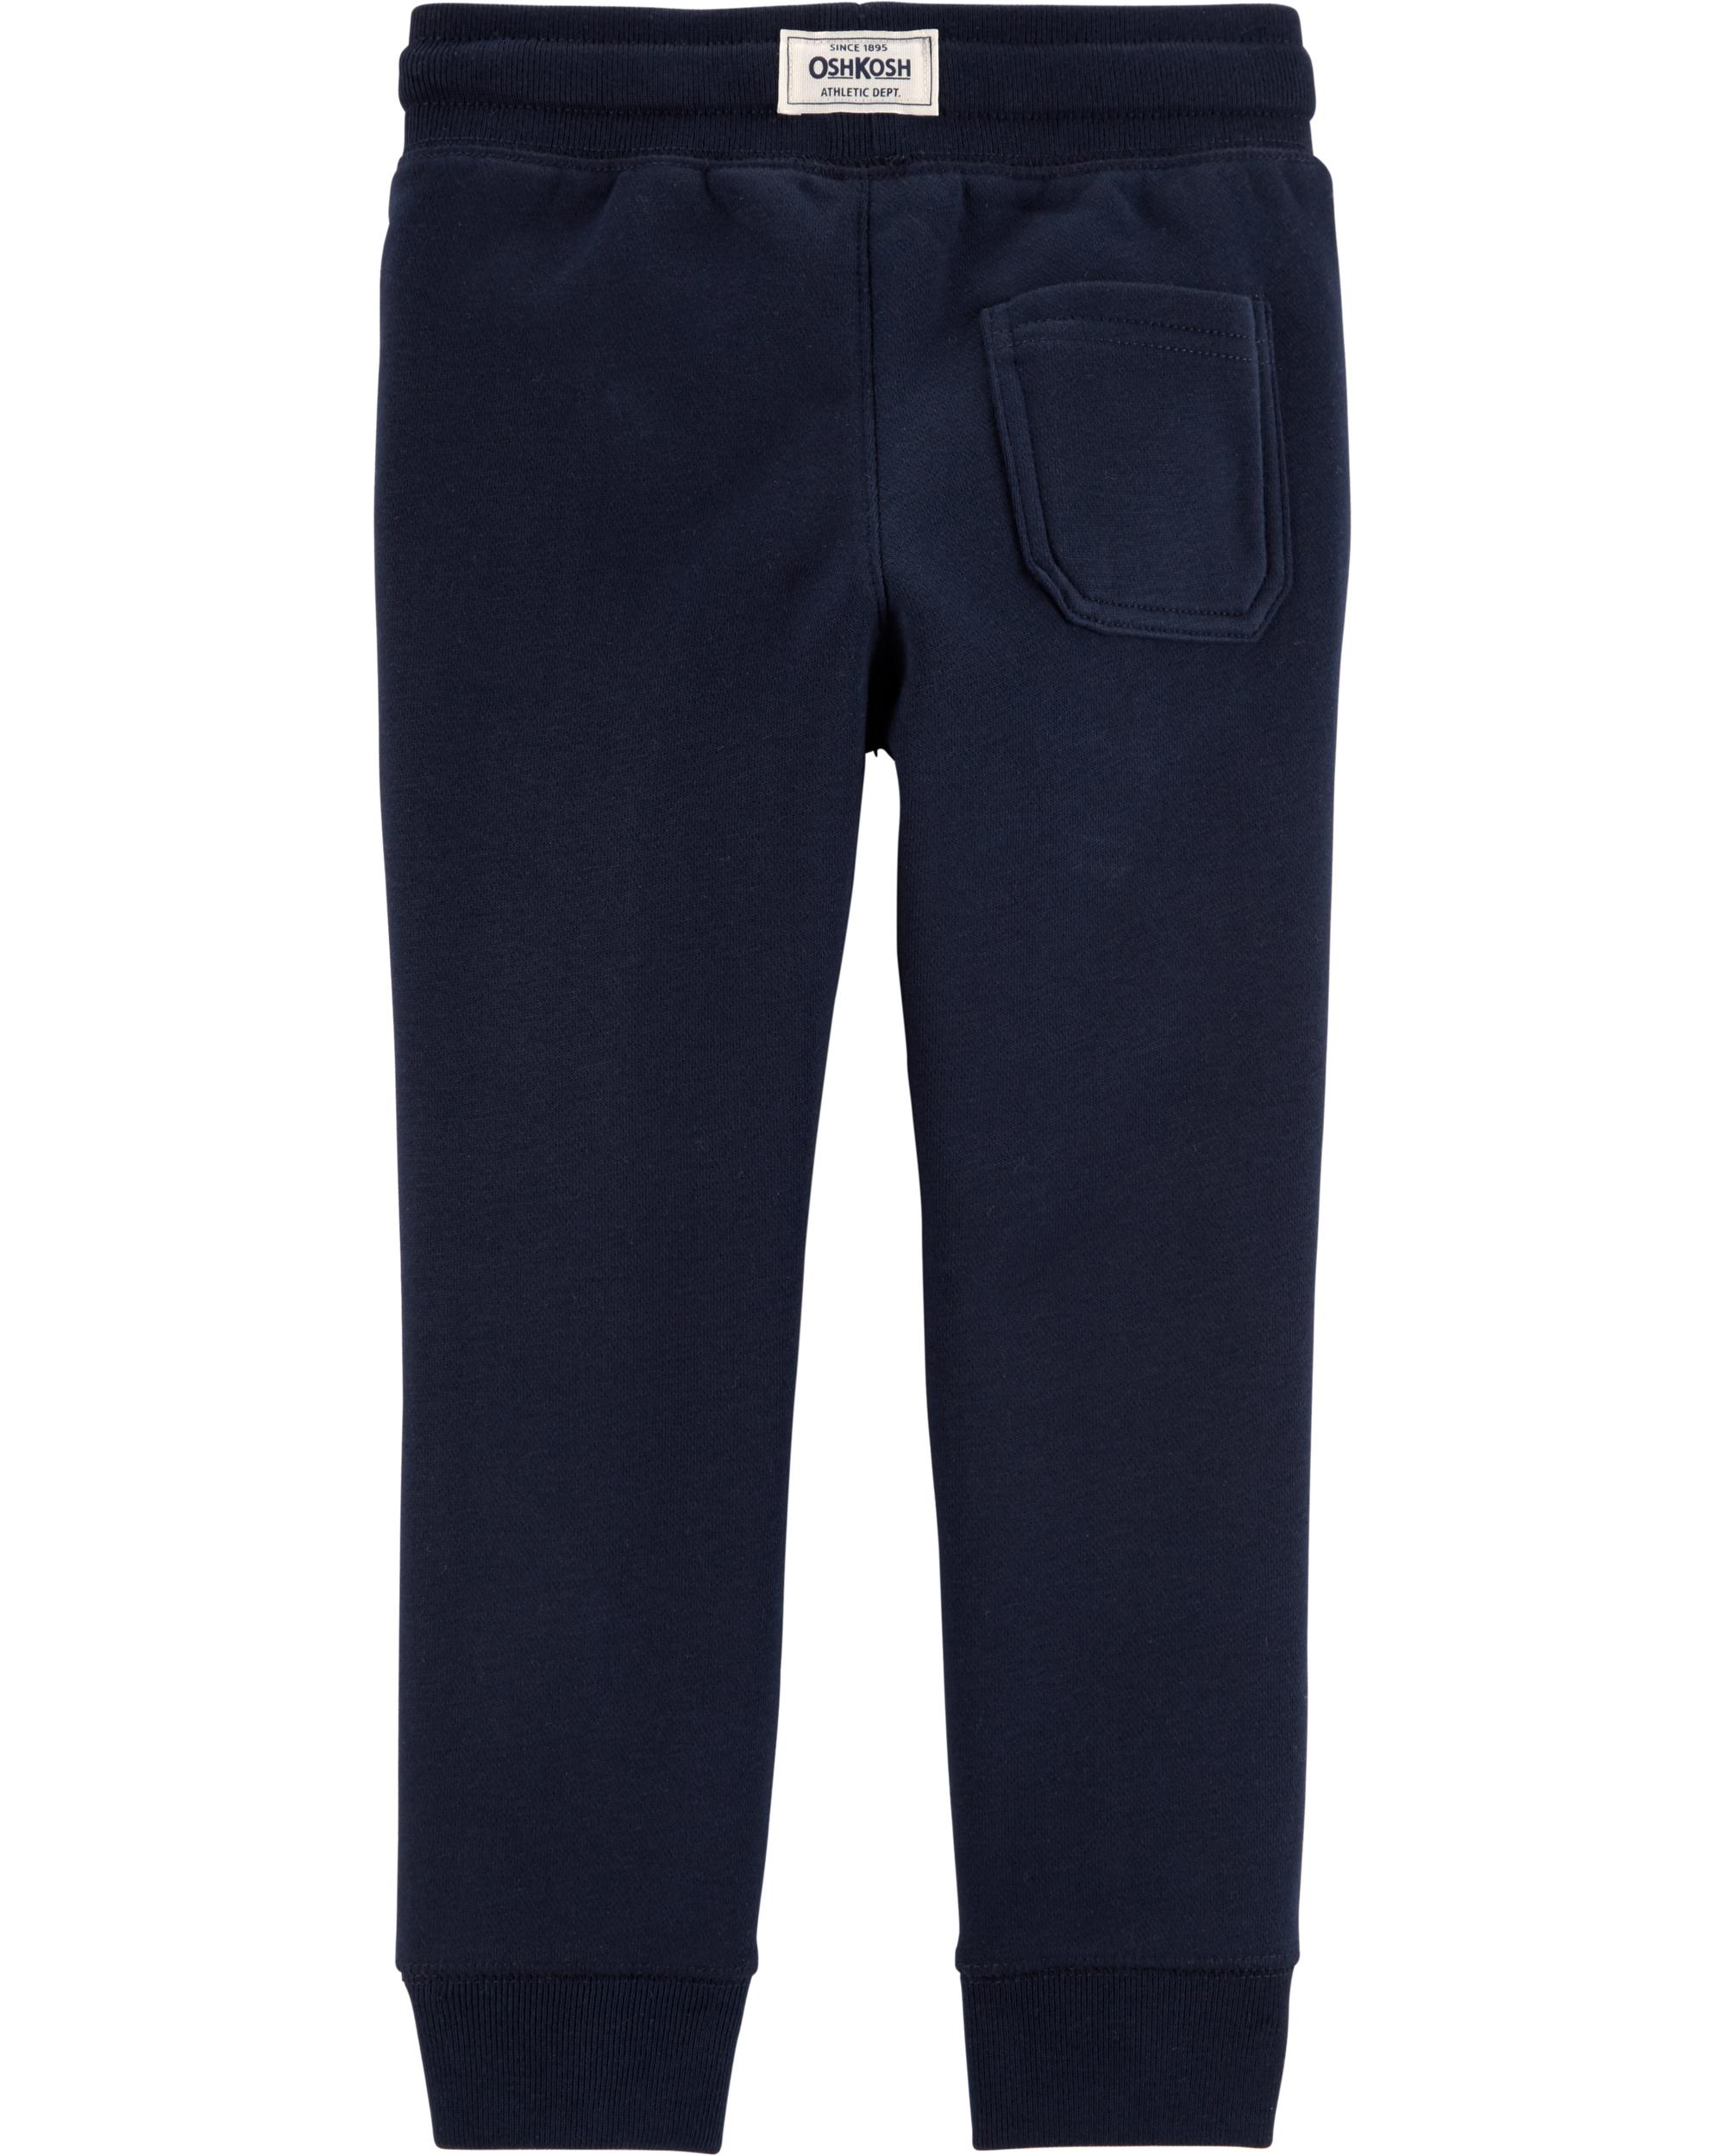 Logo Fleece Pants Oshkosh Com